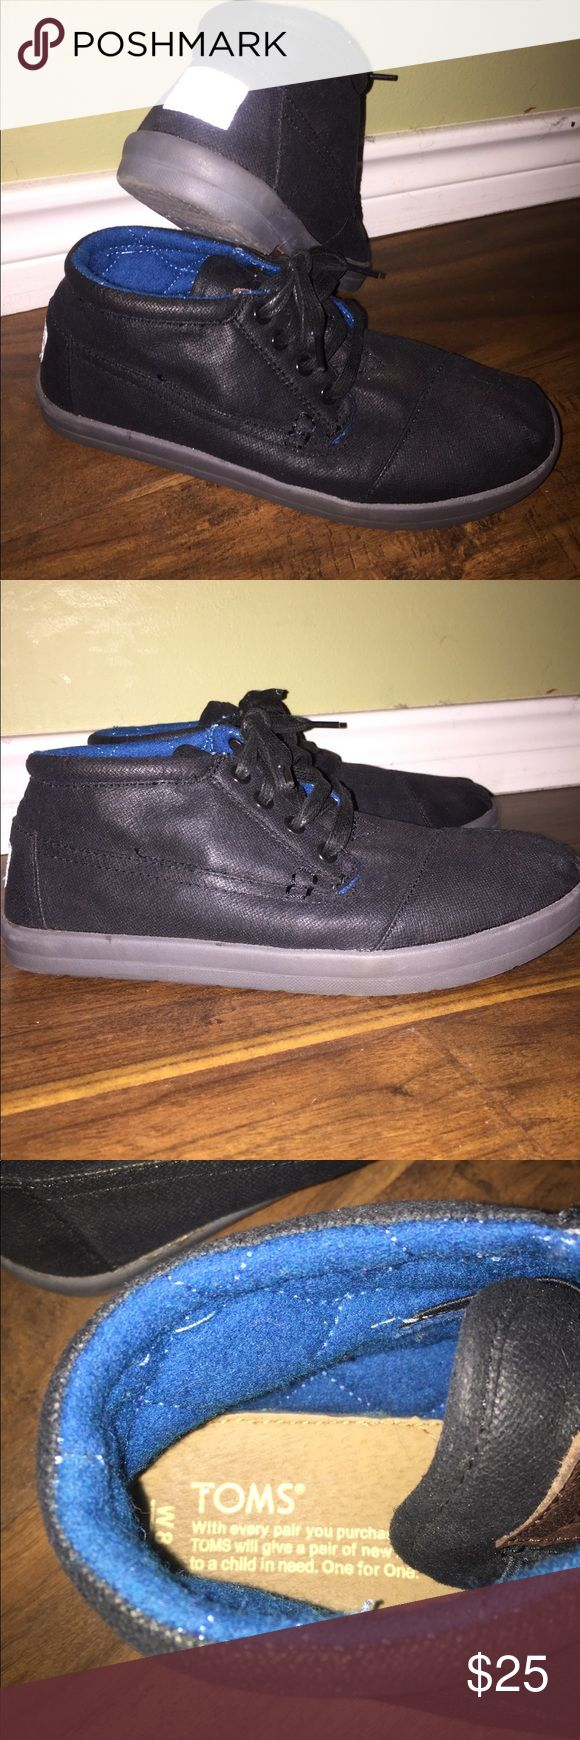 Toms Botas High Top Shoes Toms Botas High Top Shoes Color-Black w/teal blue insides Great Shape Size 8M Toms Shoes Sneakers